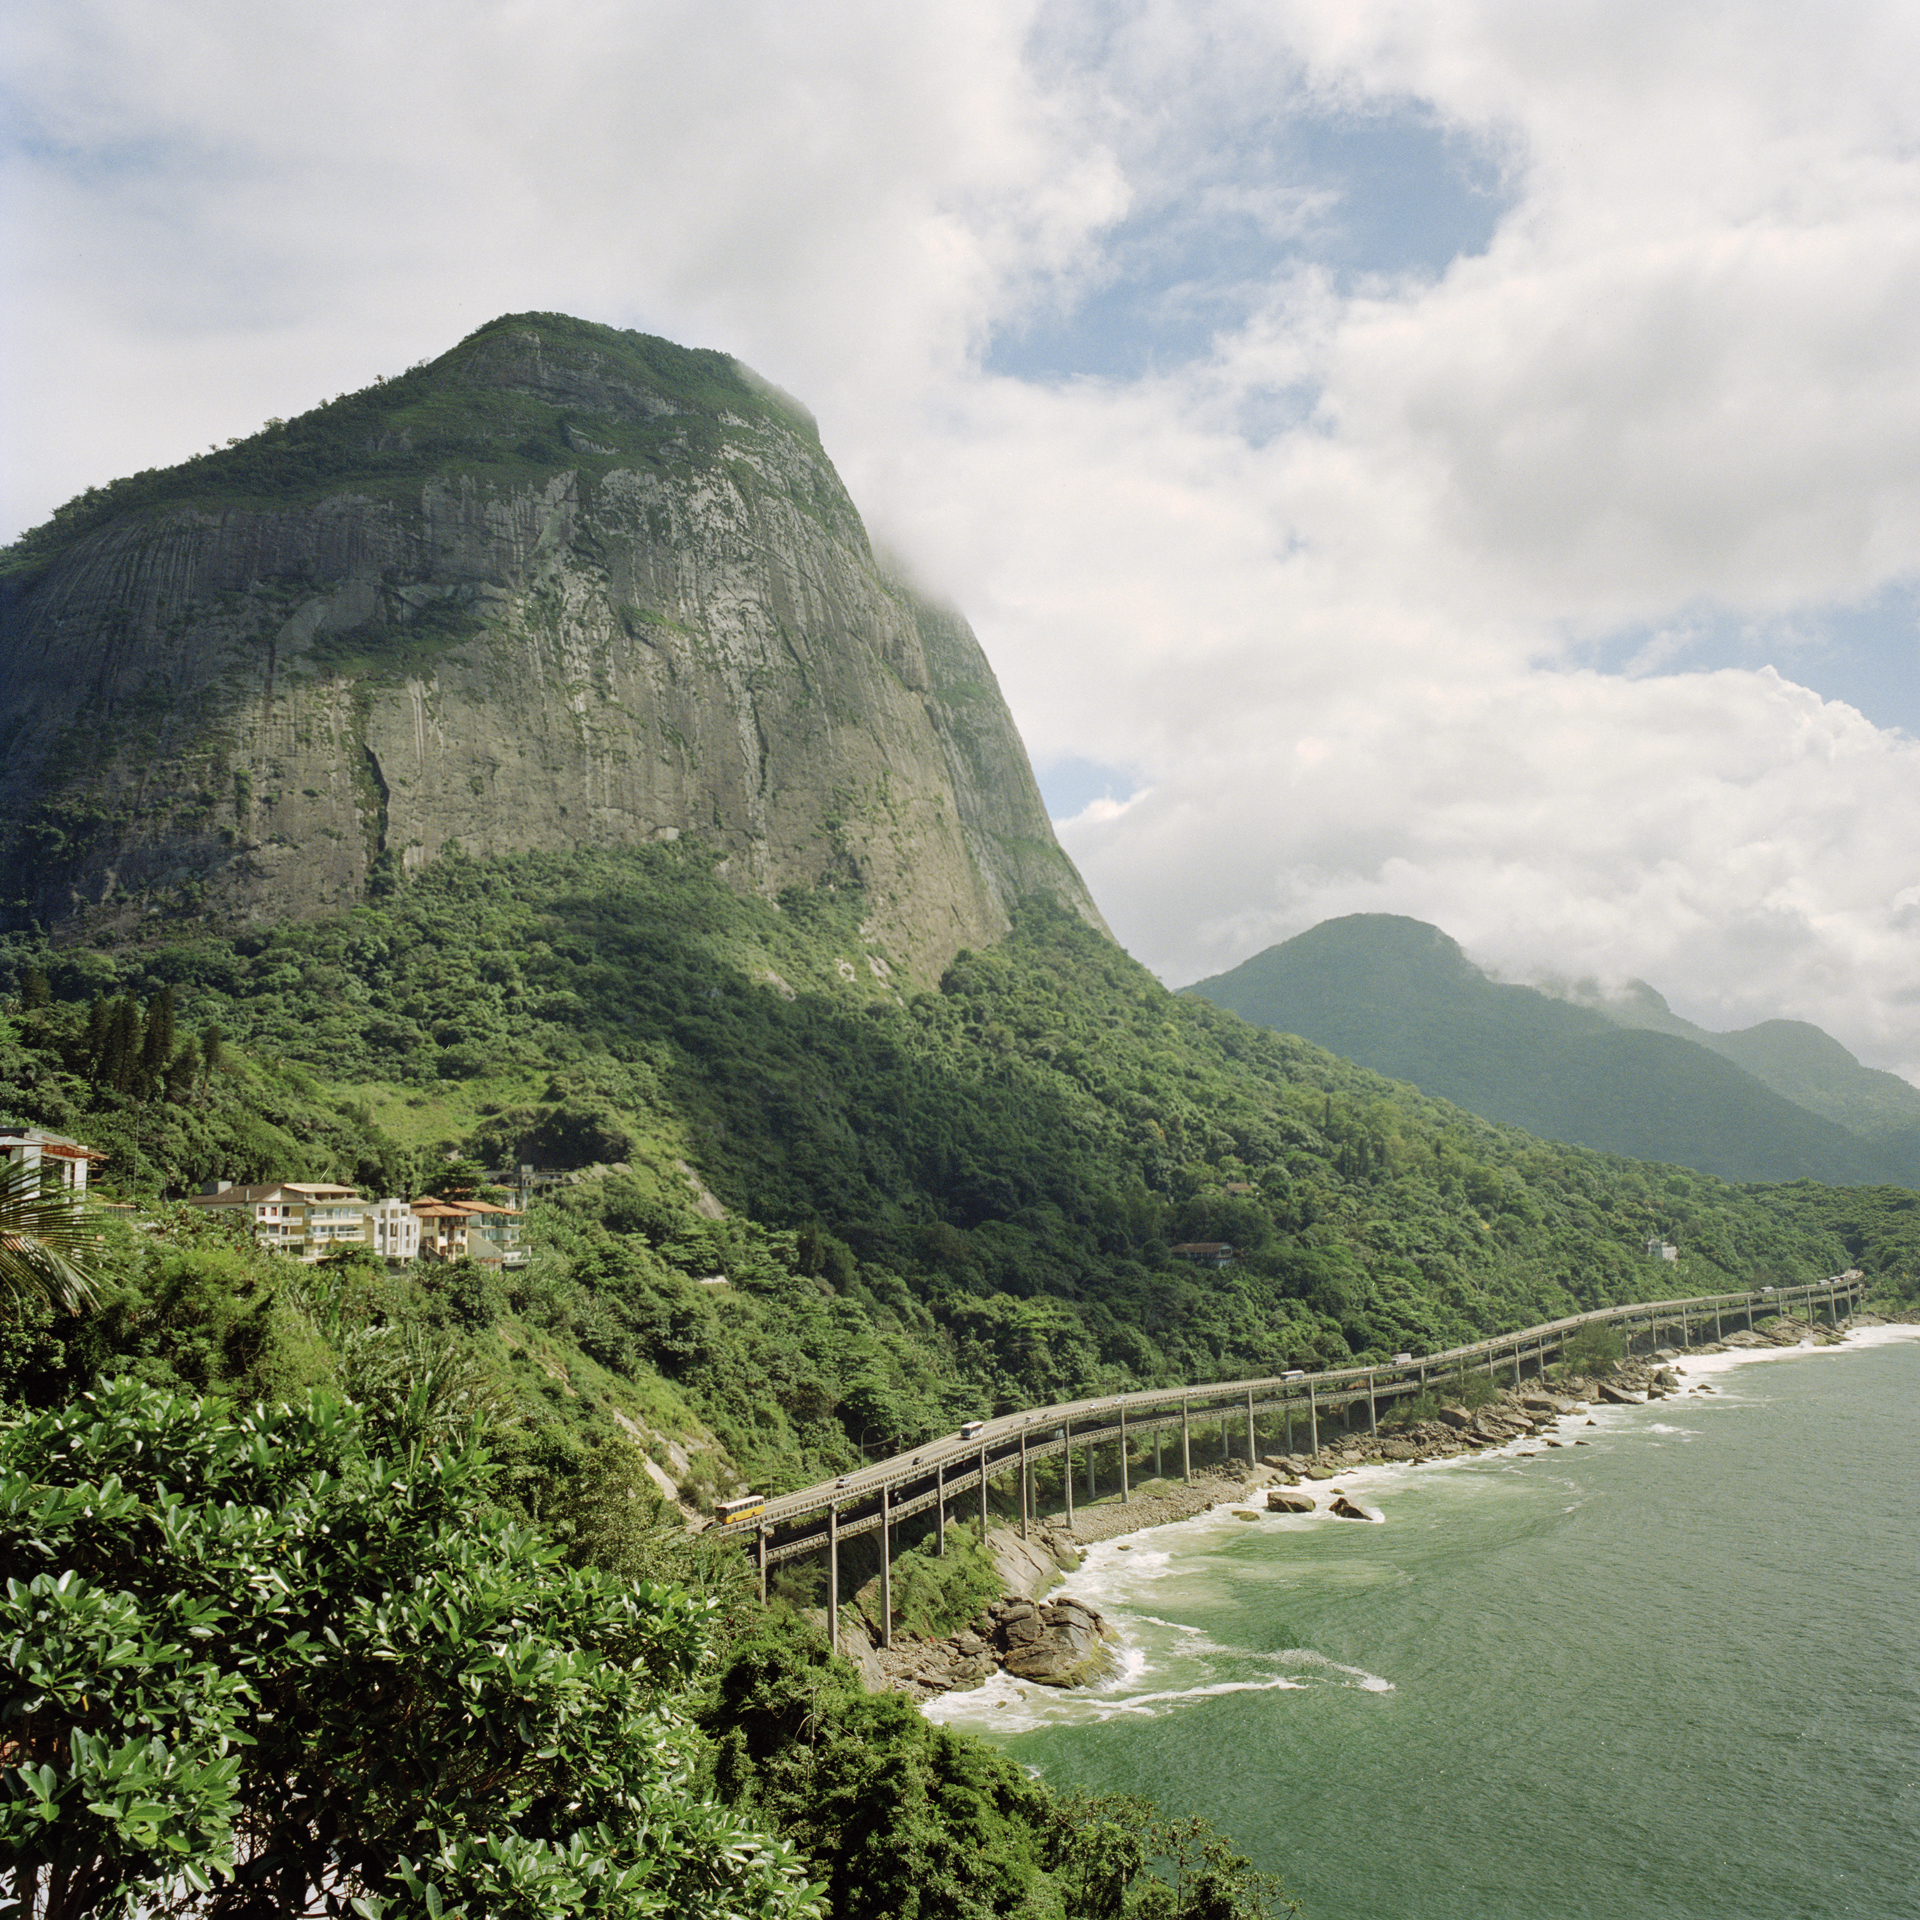 View of the Pedra da Gavea mountain from the Joatinga neighborhood, with the Elevado Das Bandeiras highway below.